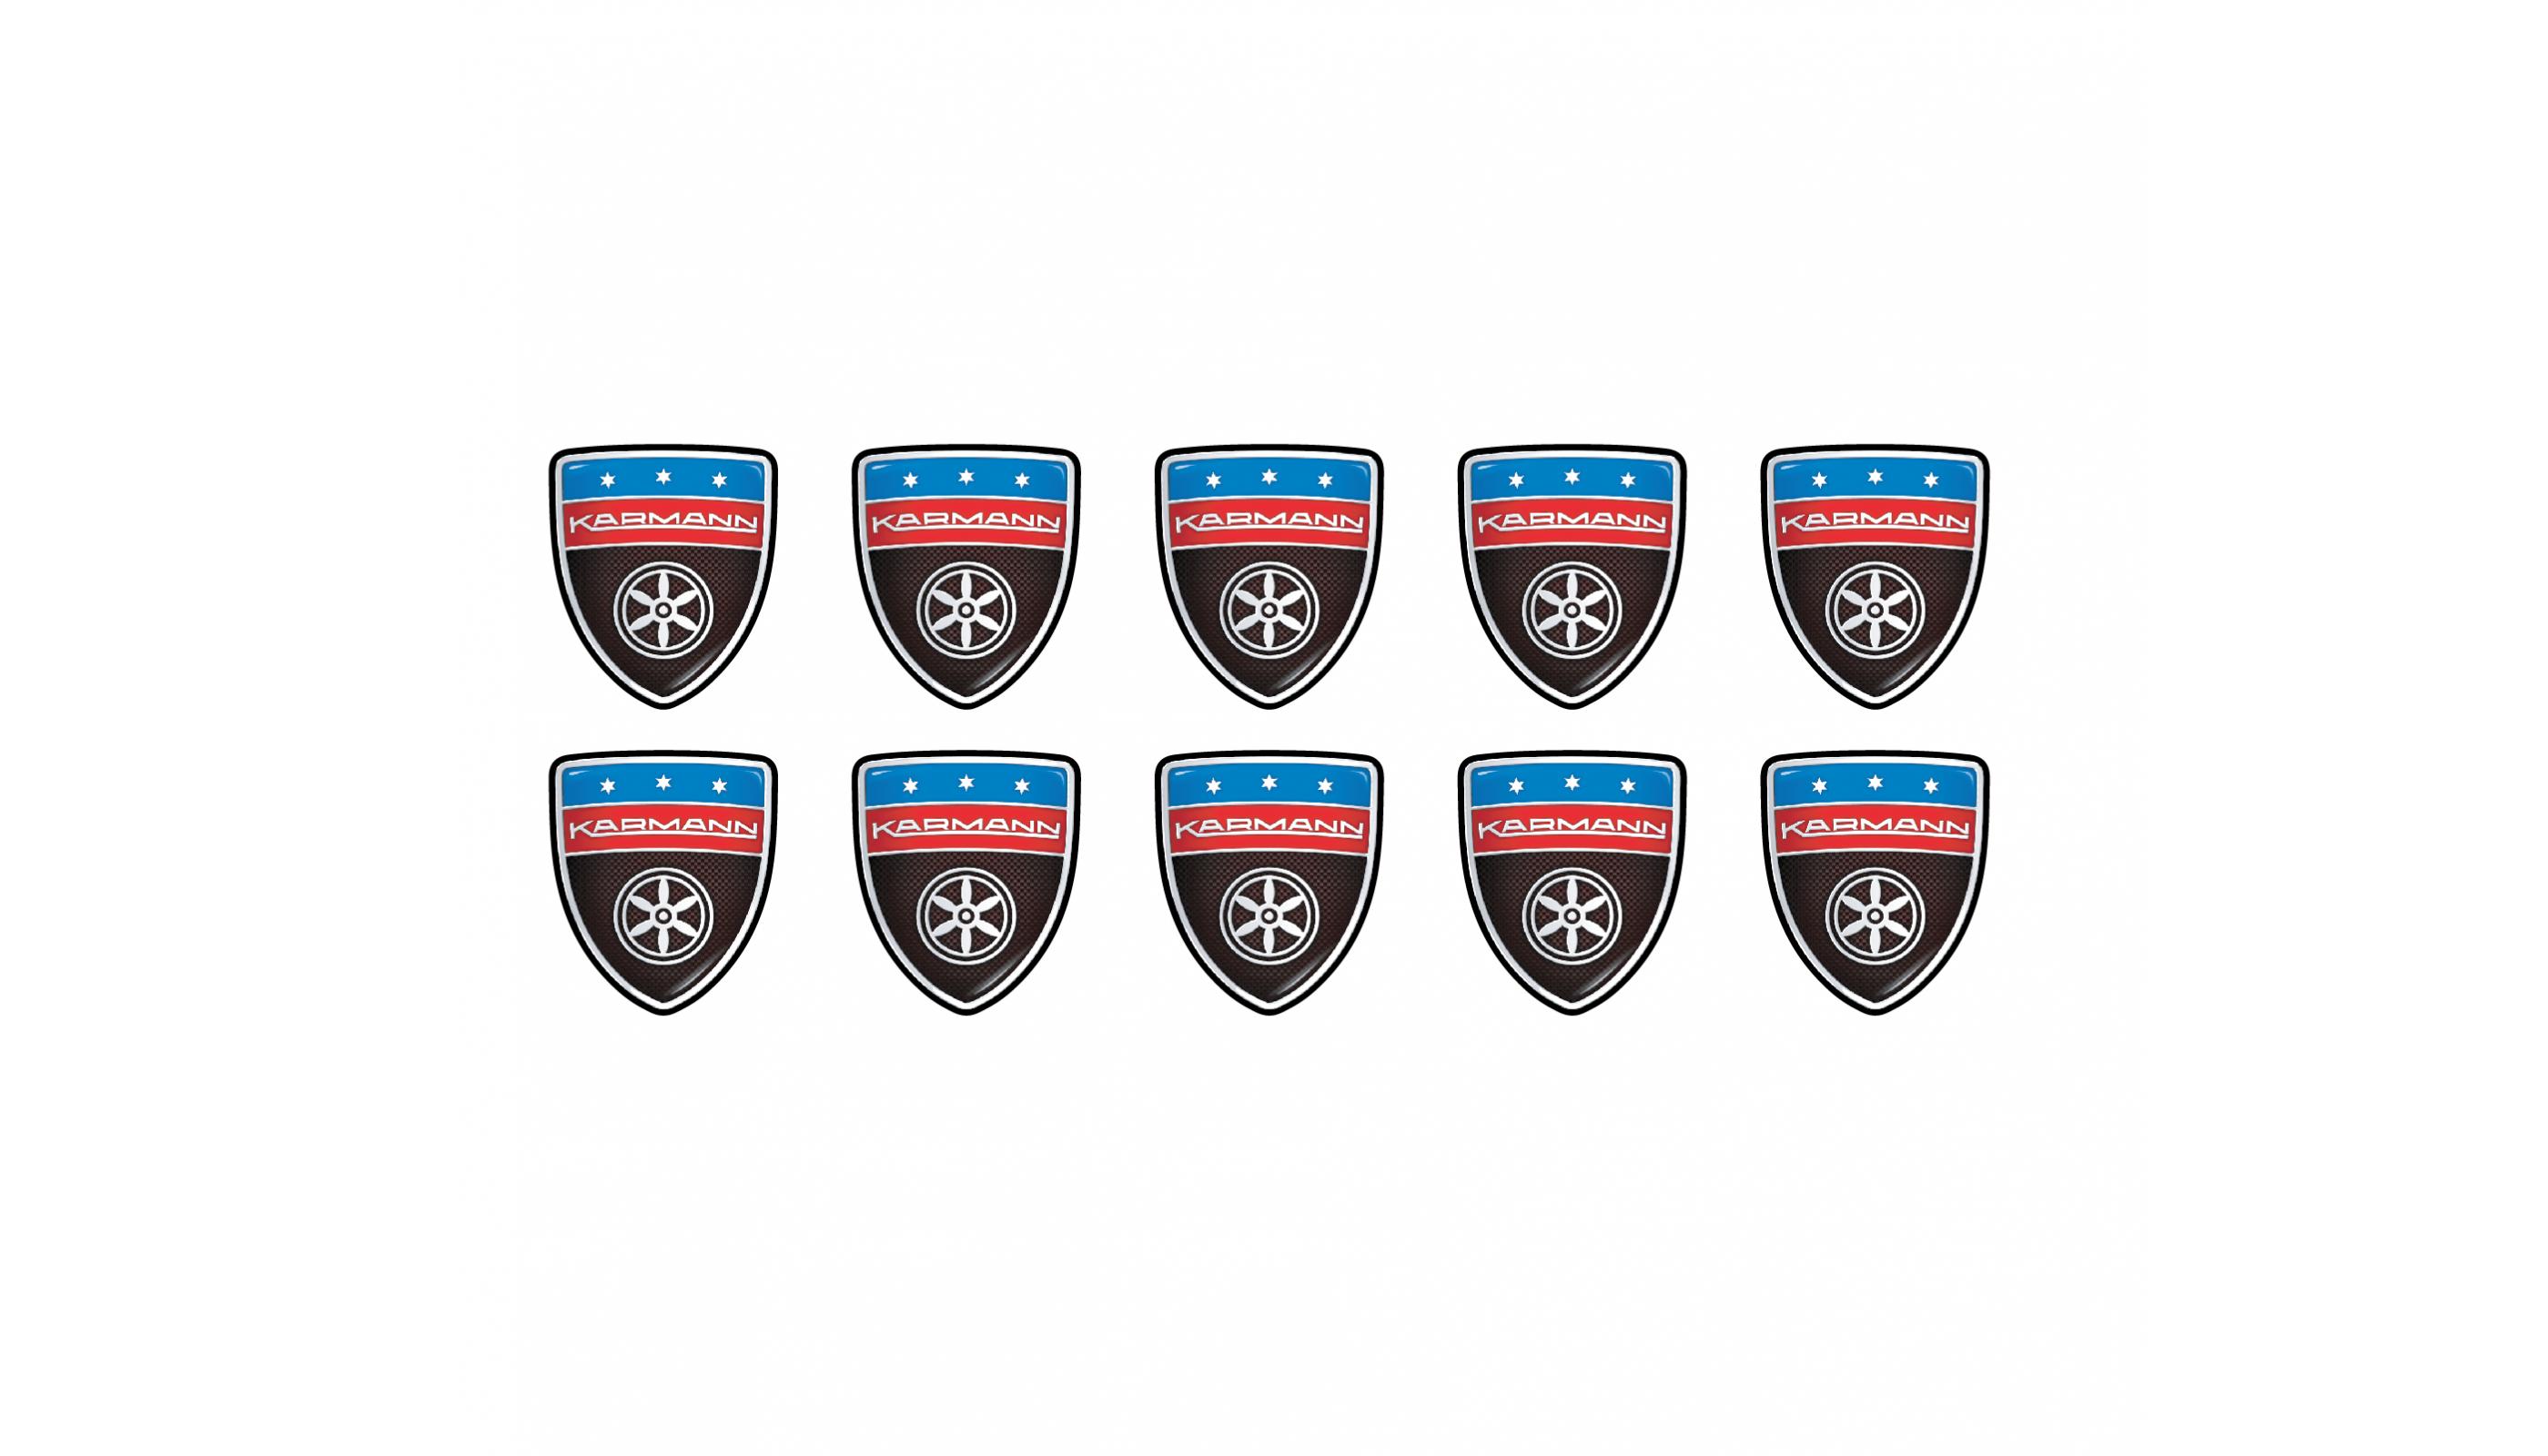 Karmann shield small carbon emblems